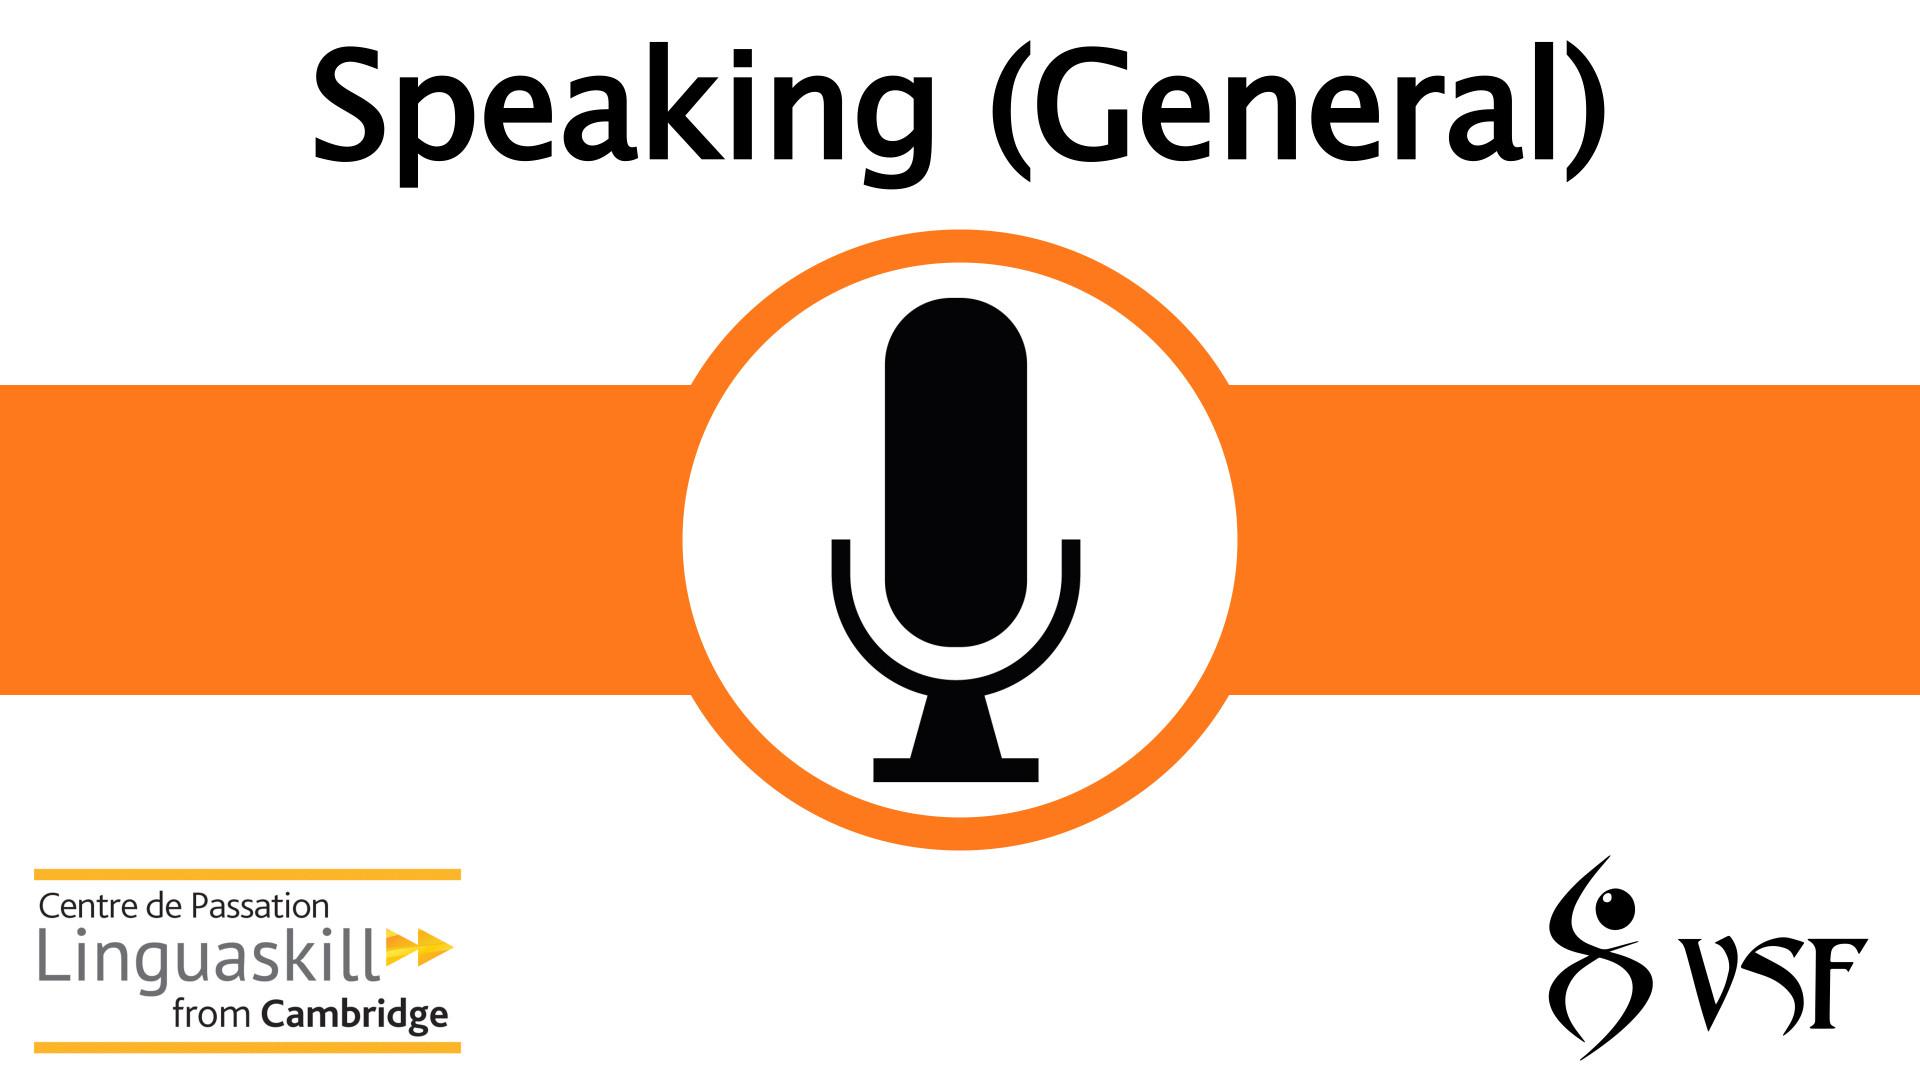 V1- Speaking (General)